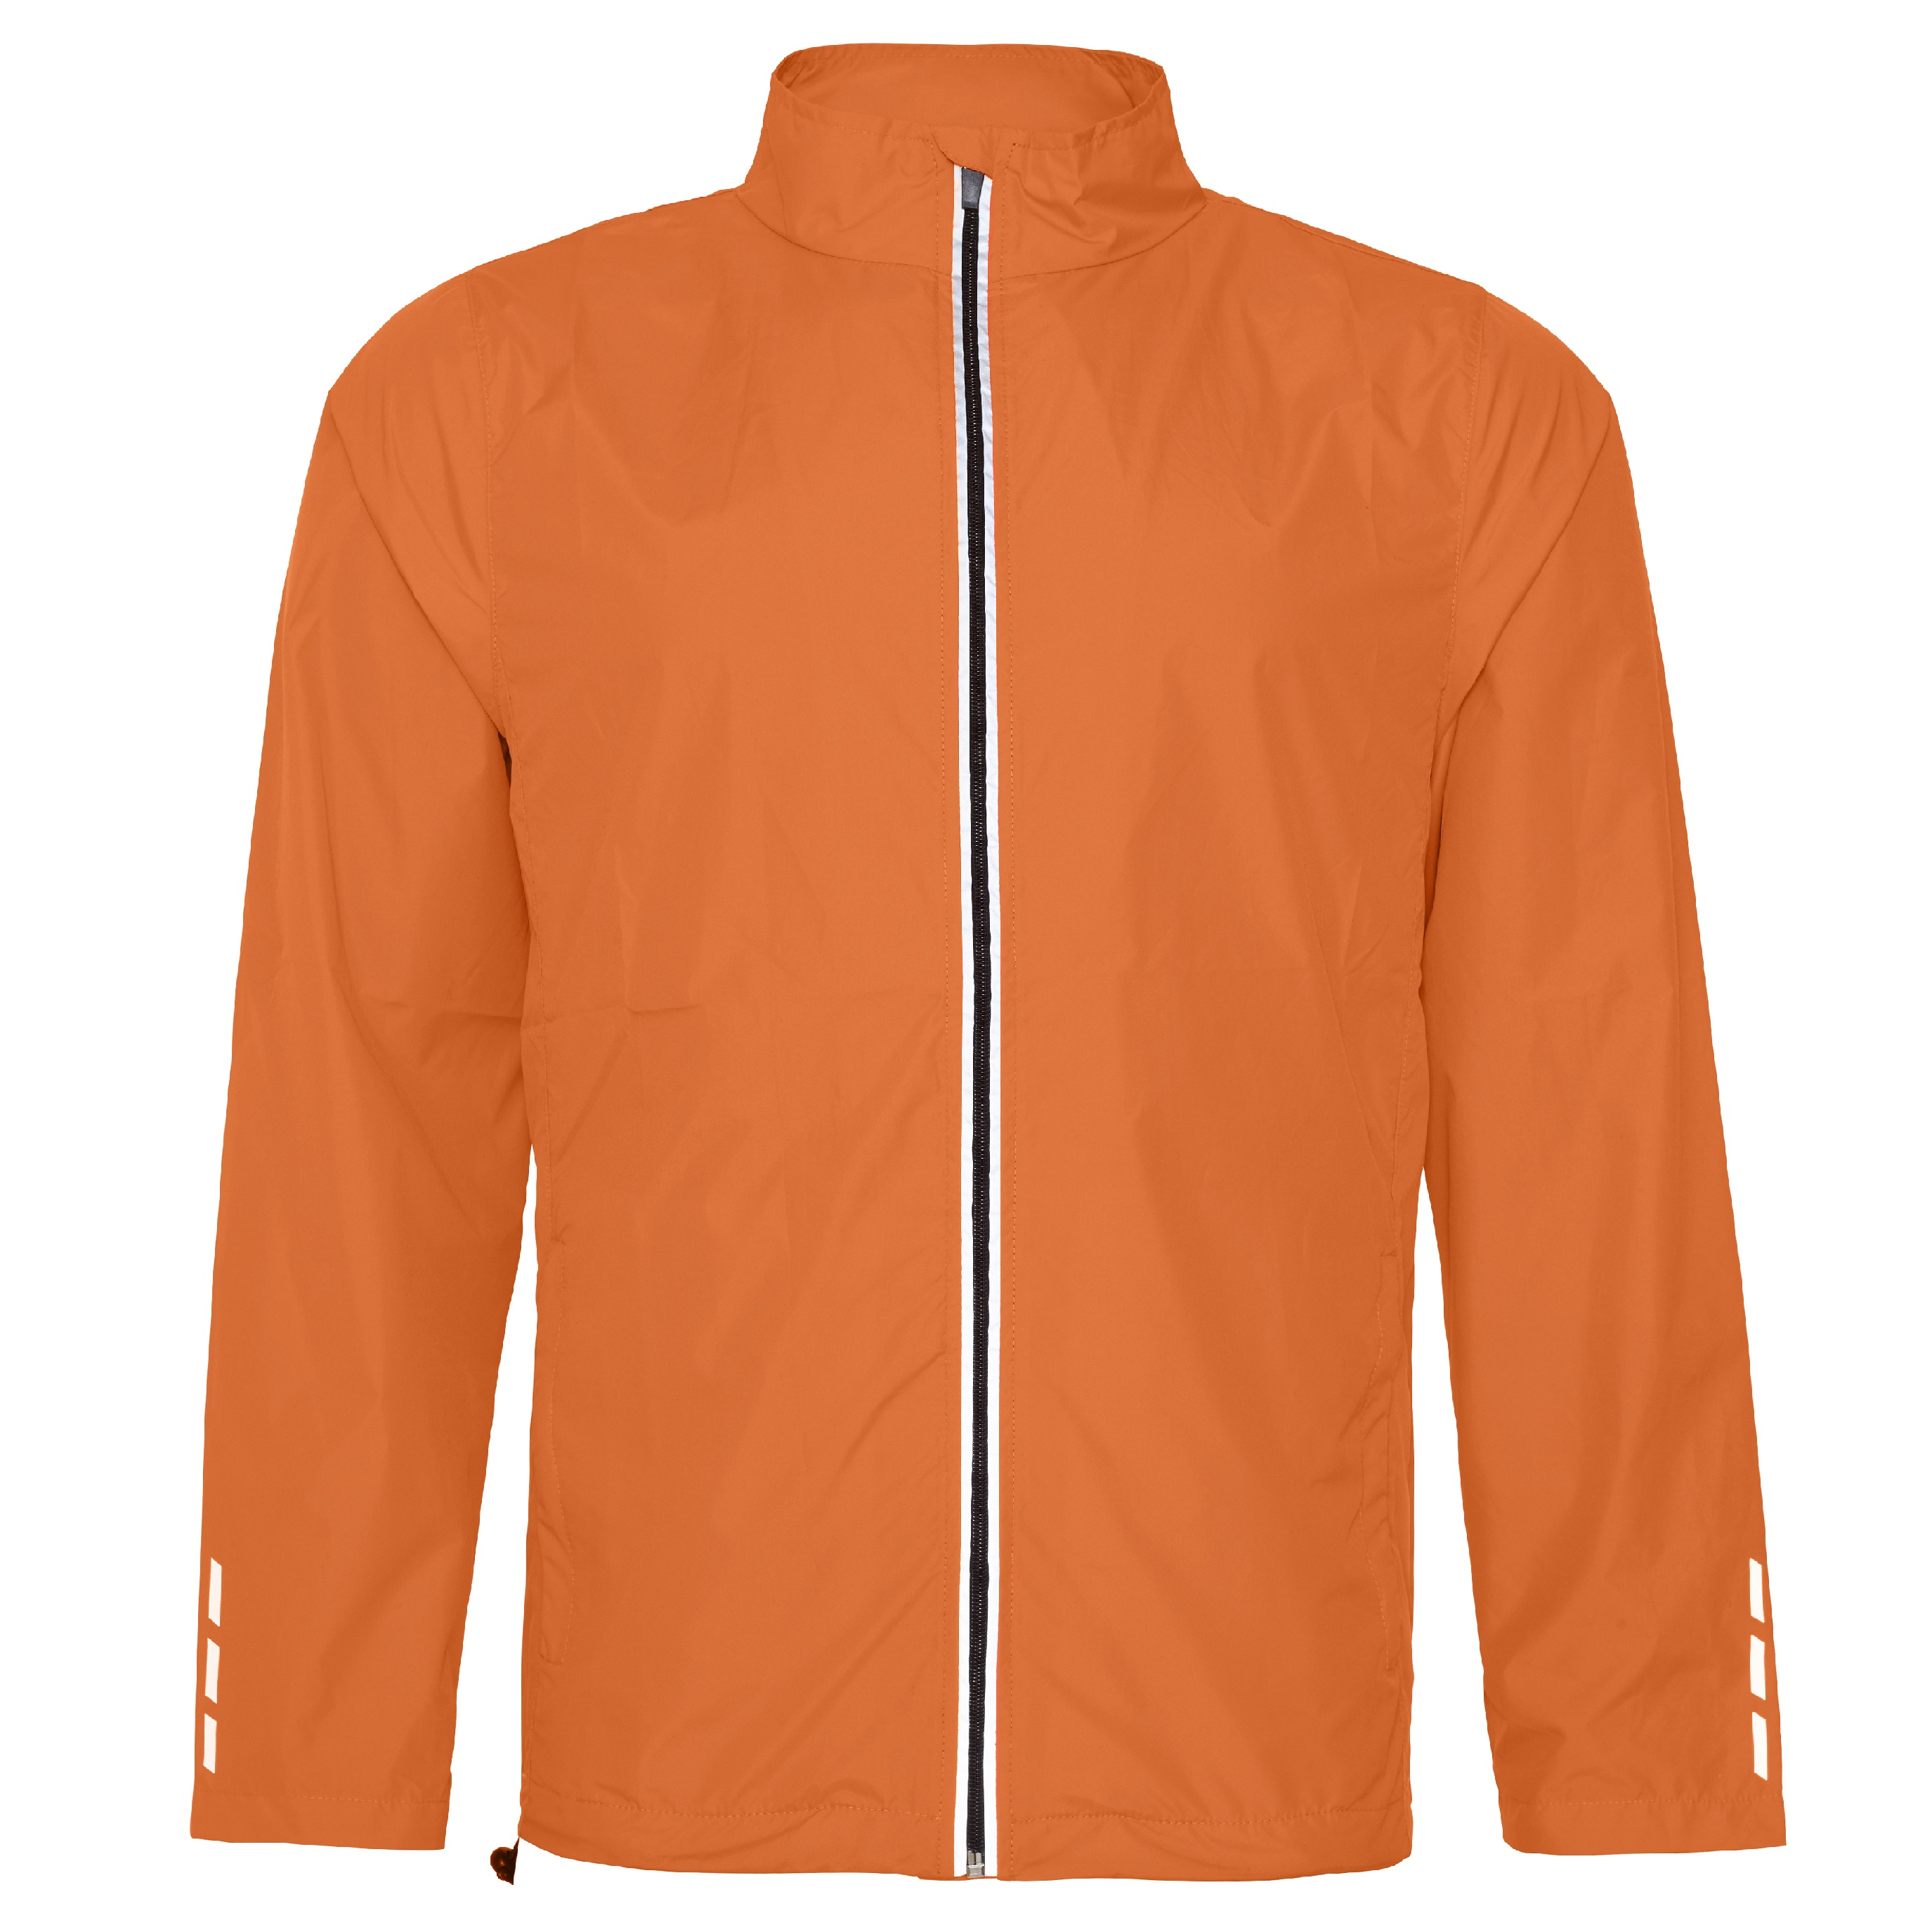 Juoksijan takki Cool, Orange Crush